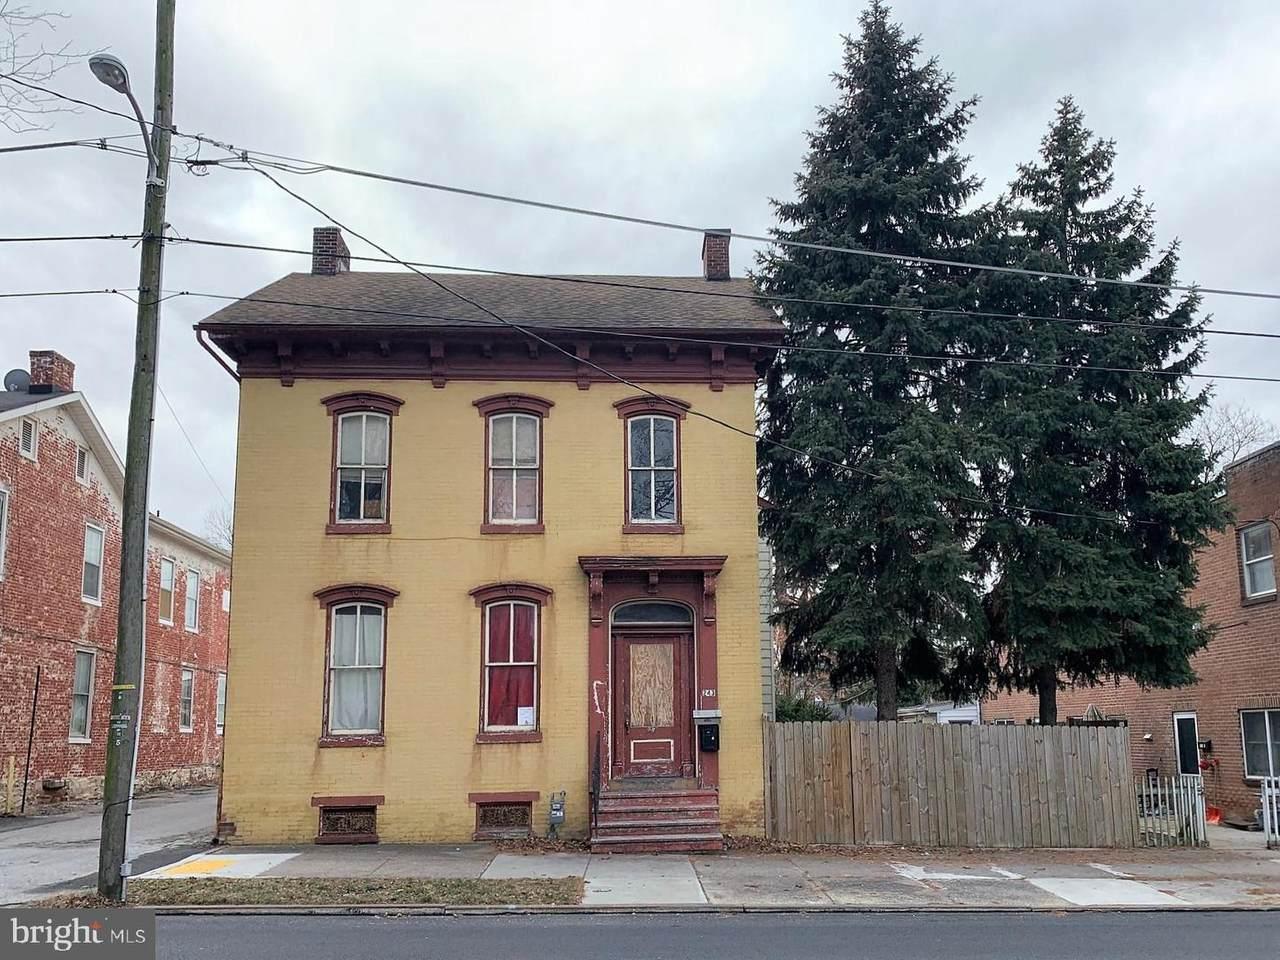 243 Baltimore Street - Photo 1